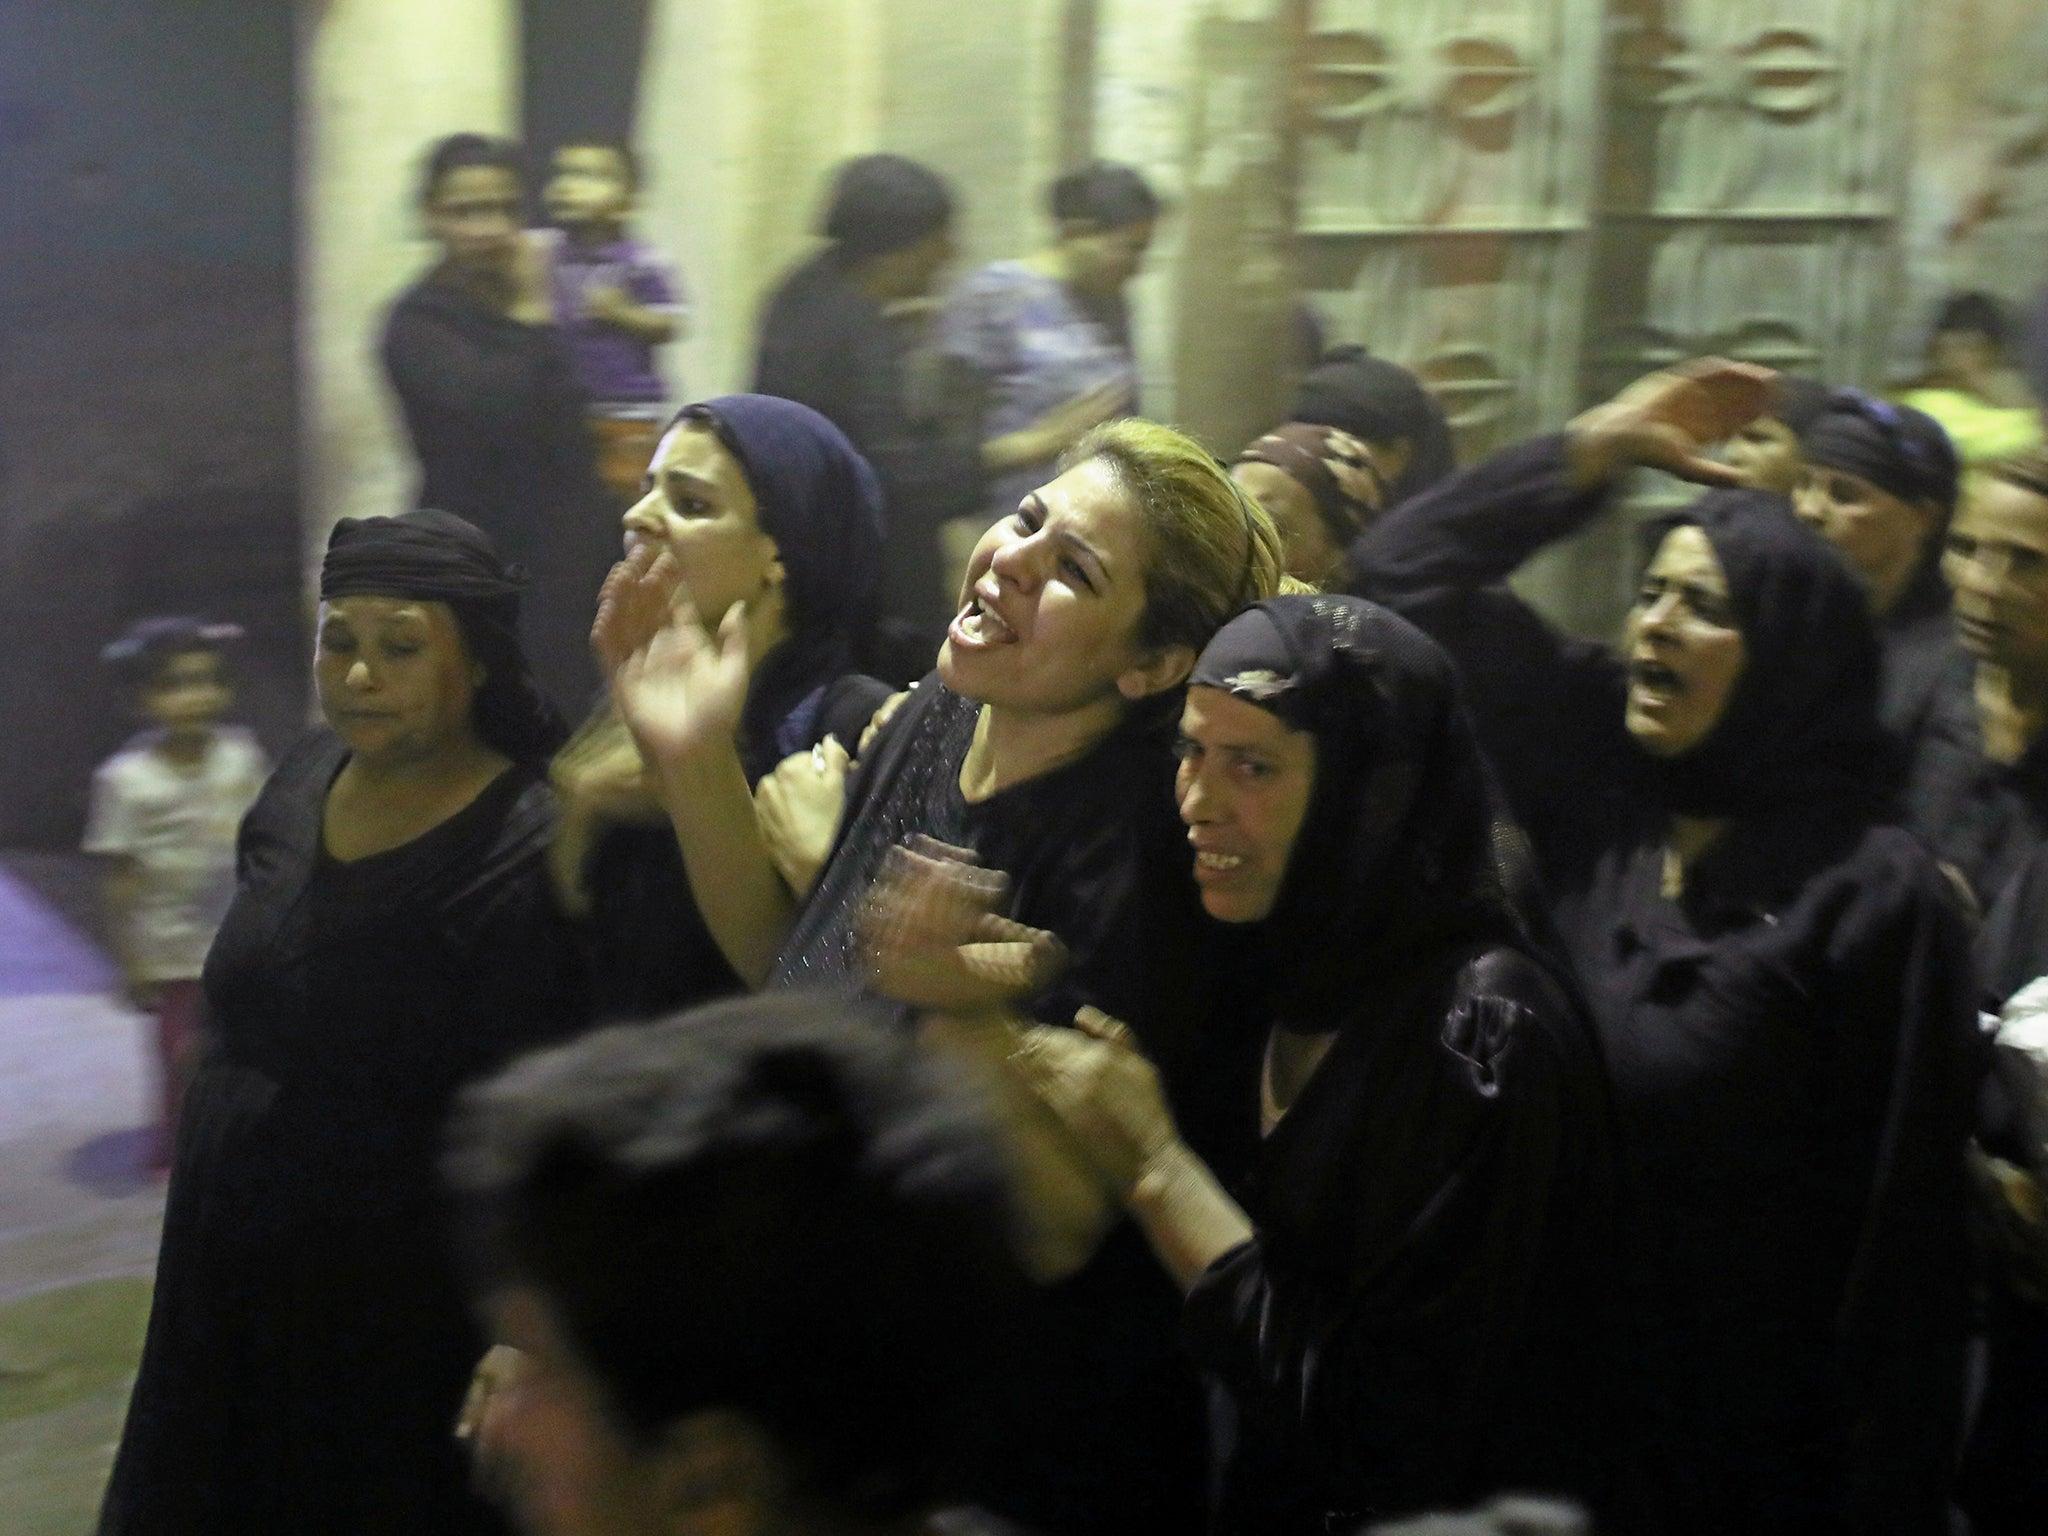 Minya bus shooting: Pope Francis calls Coptic Christians